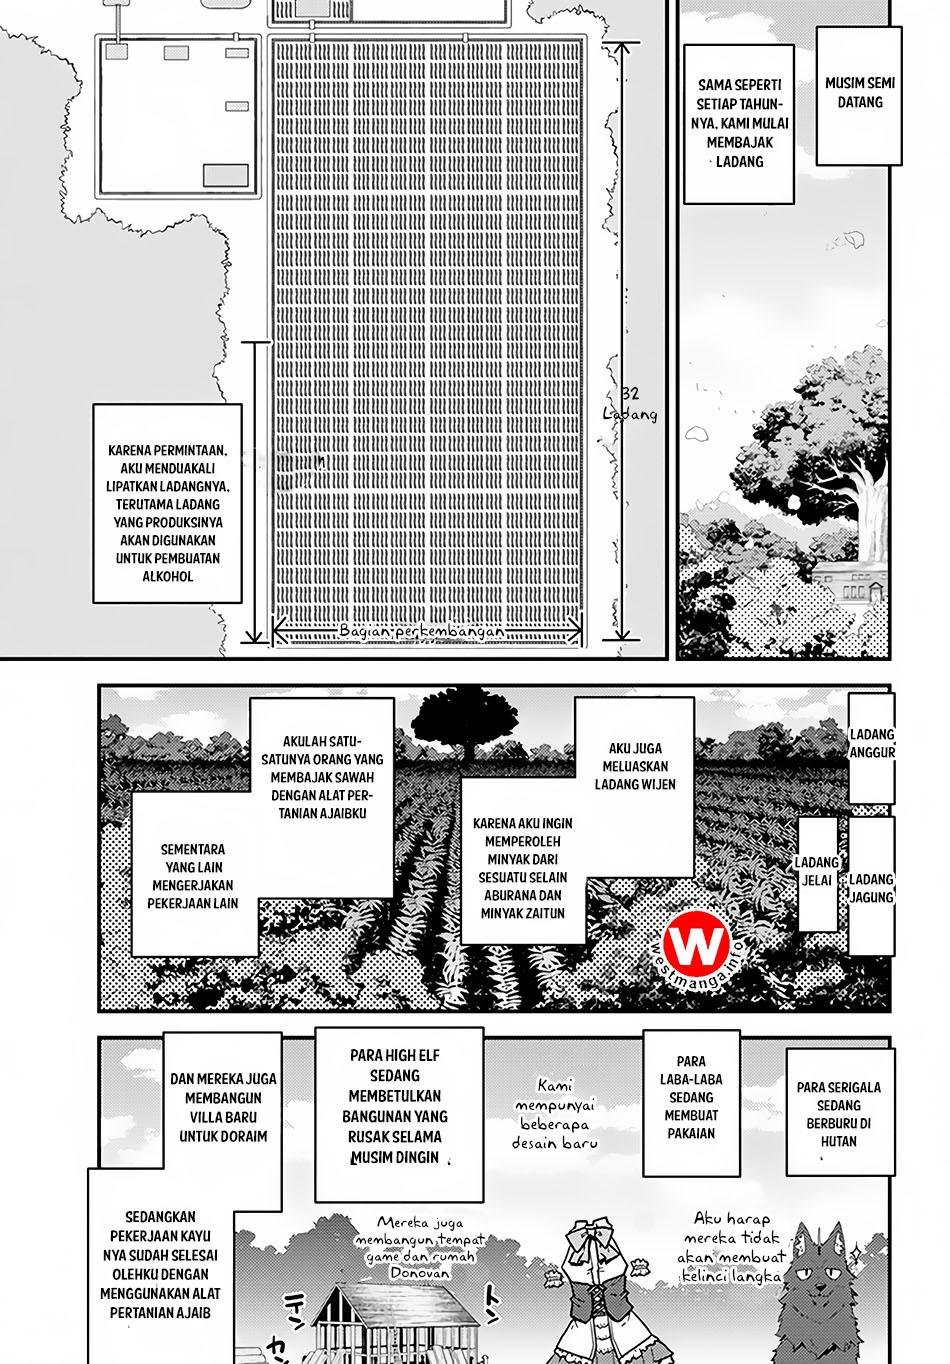 Komik isekai nonbiri nouka 029 - chapter 29 30 Indonesia isekai nonbiri nouka 029 - chapter 29 Terbaru 9|Baca Manga Komik Indonesia